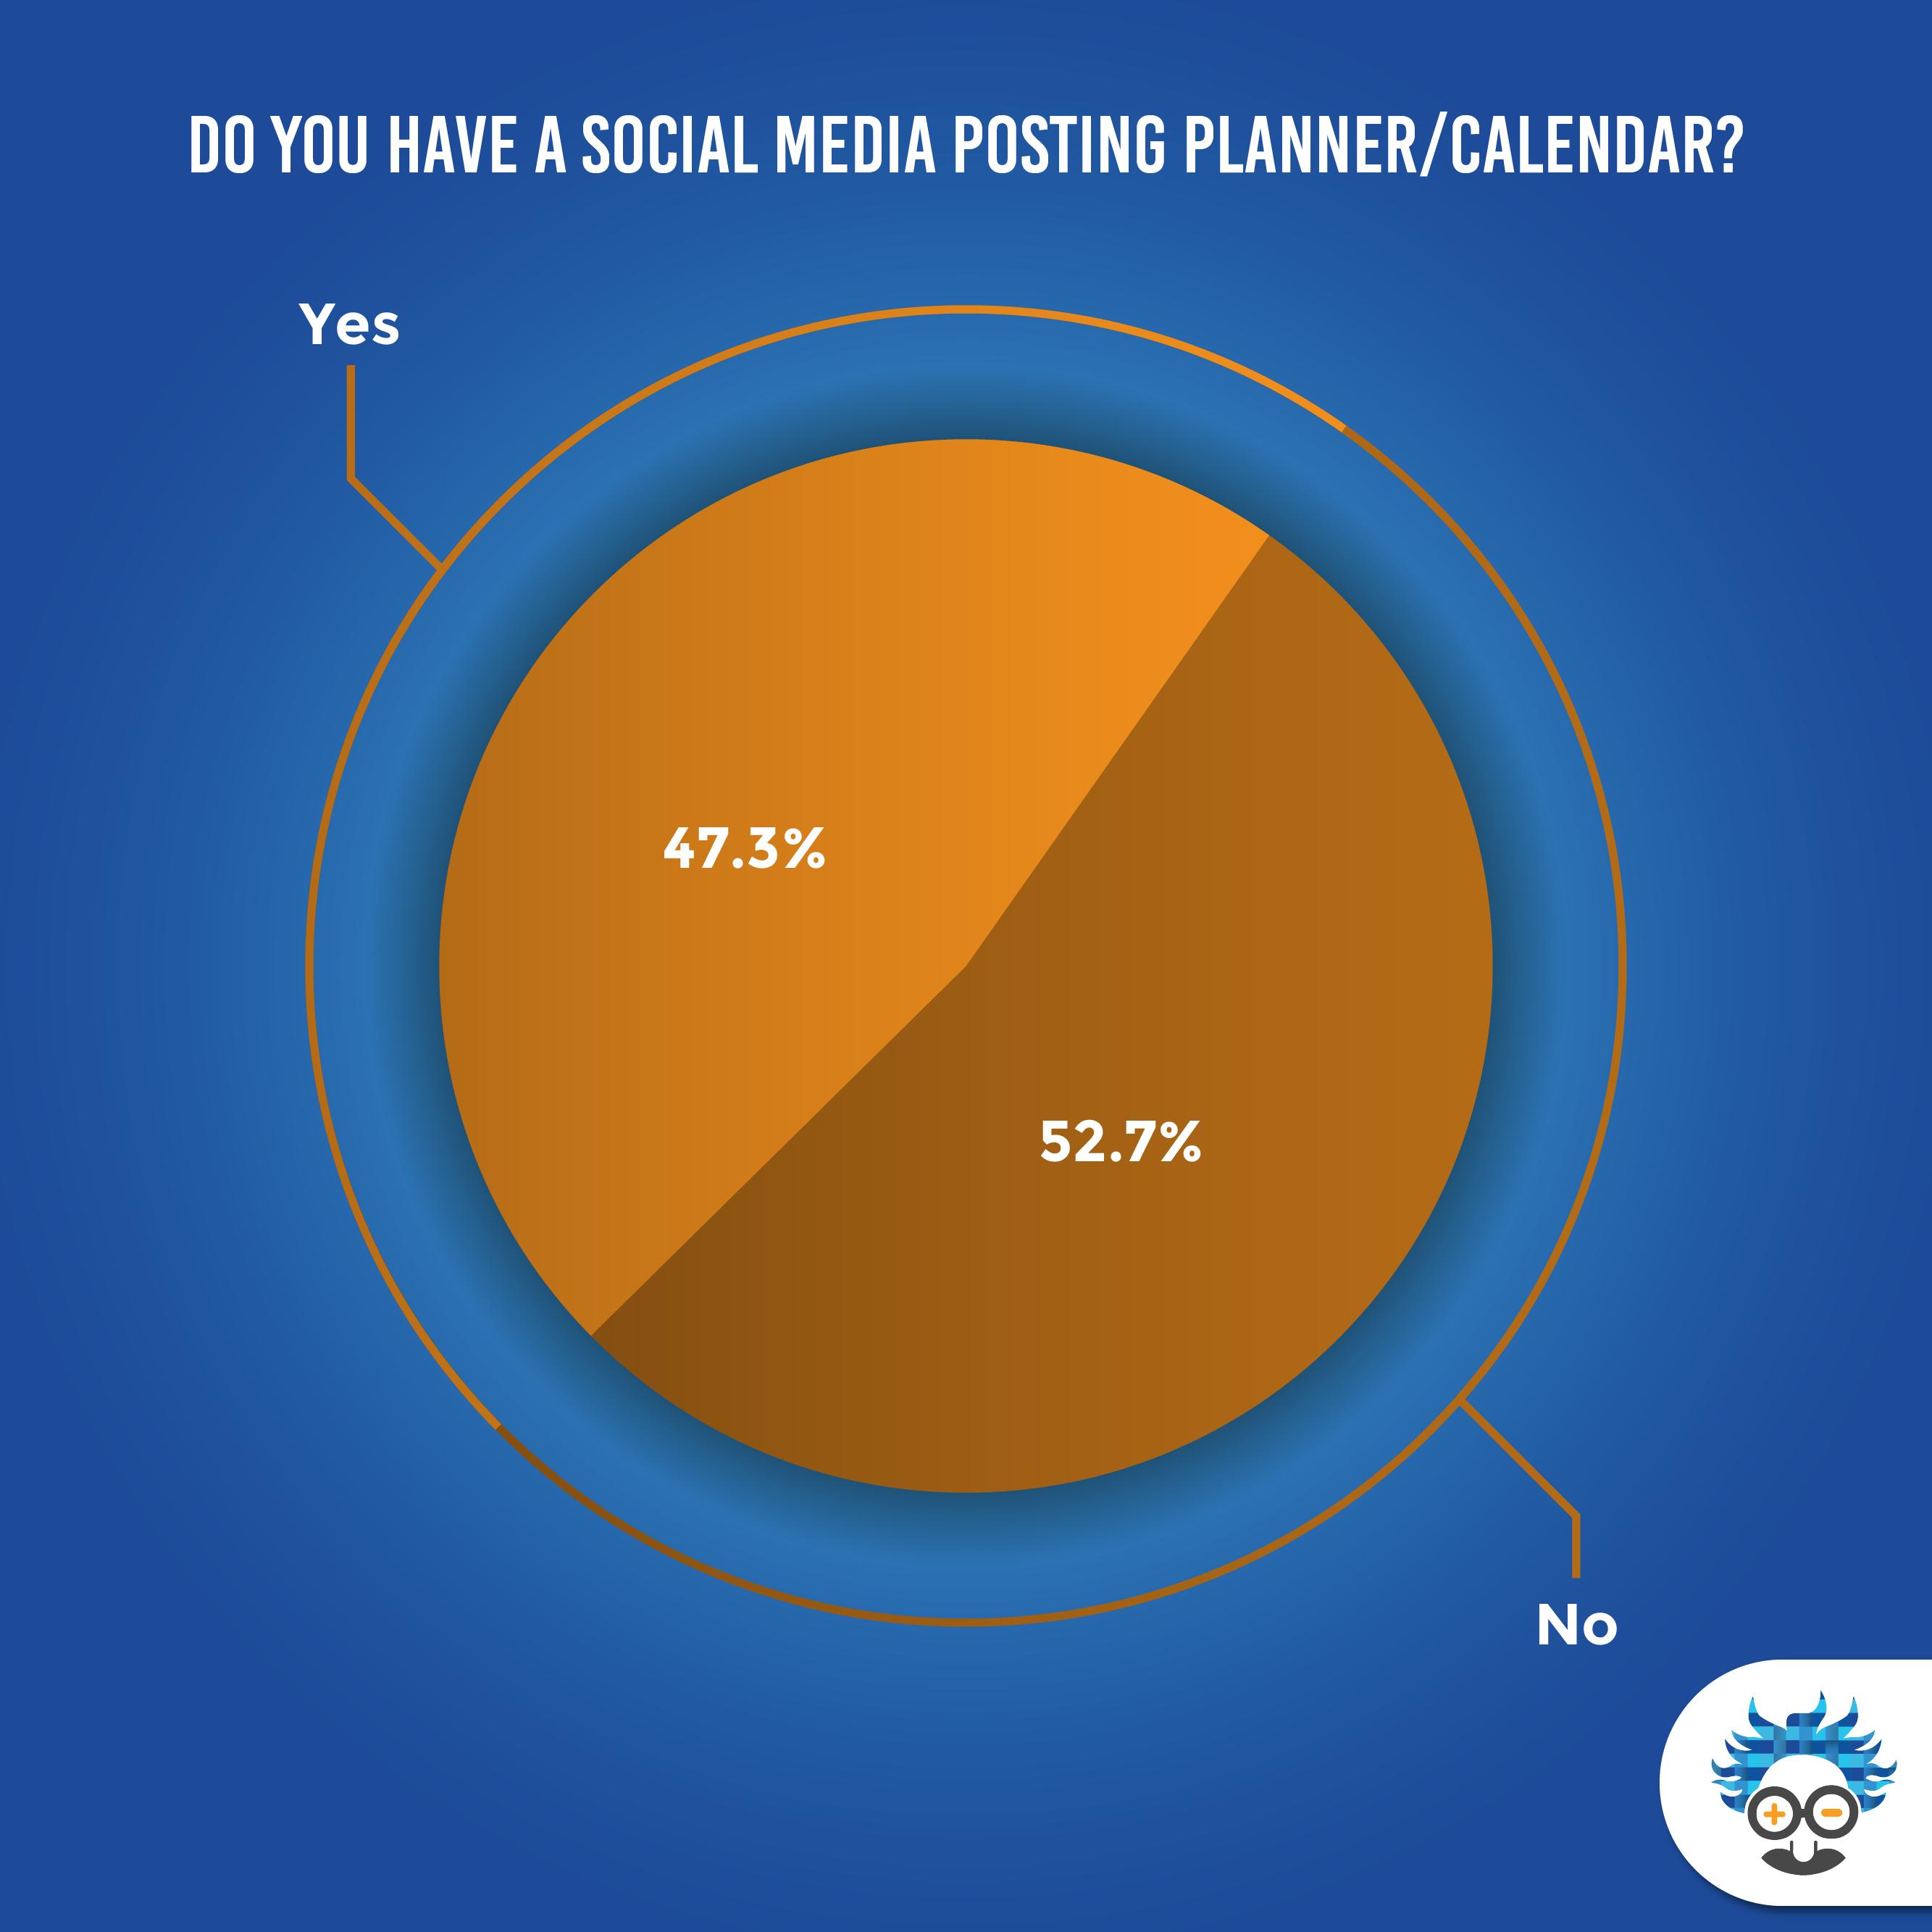 social media posting planner results